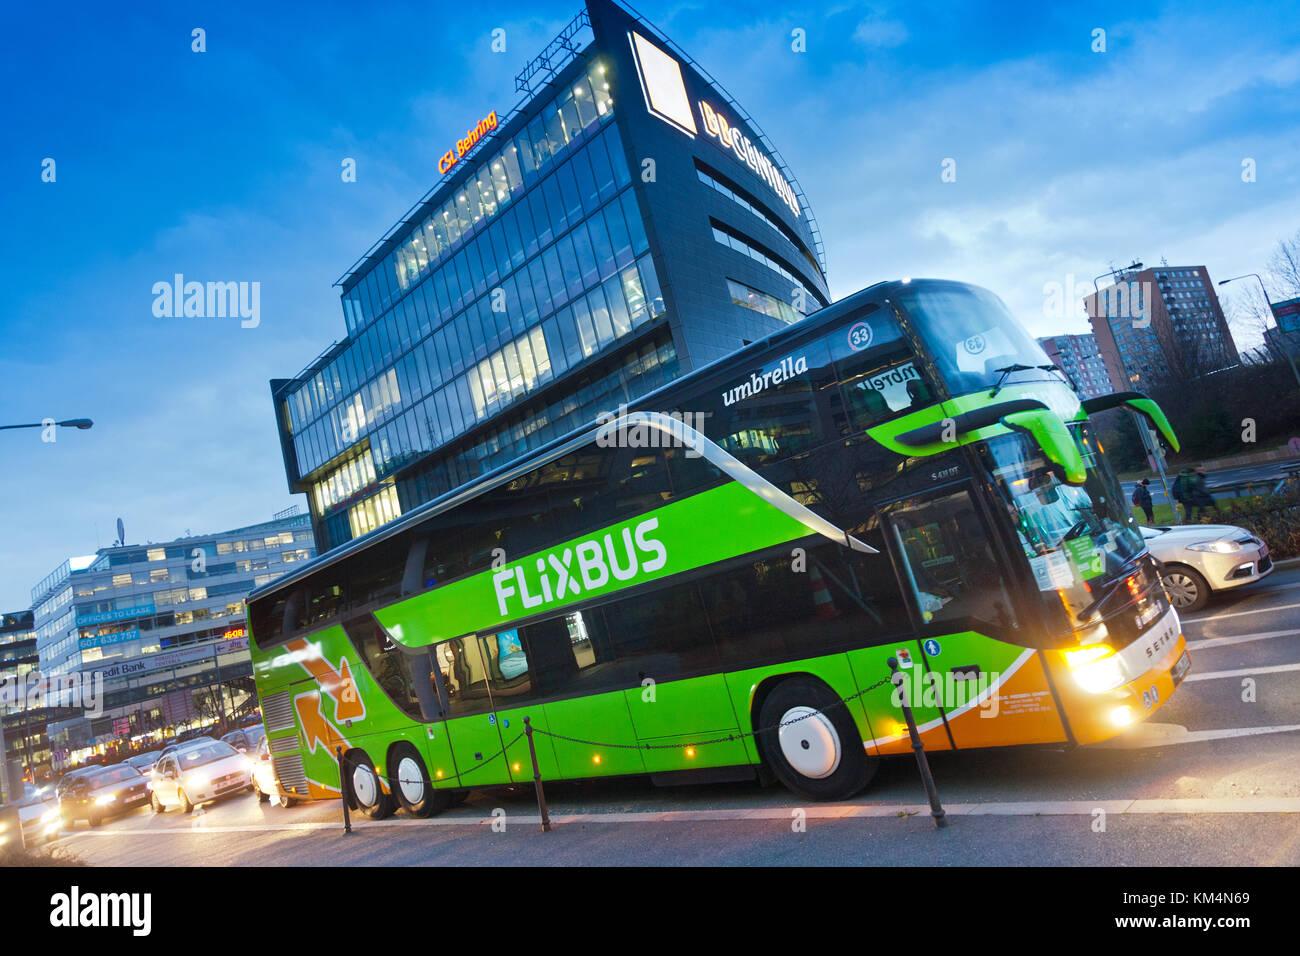 flixbus stockfotos flixbus bilder alamy. Black Bedroom Furniture Sets. Home Design Ideas